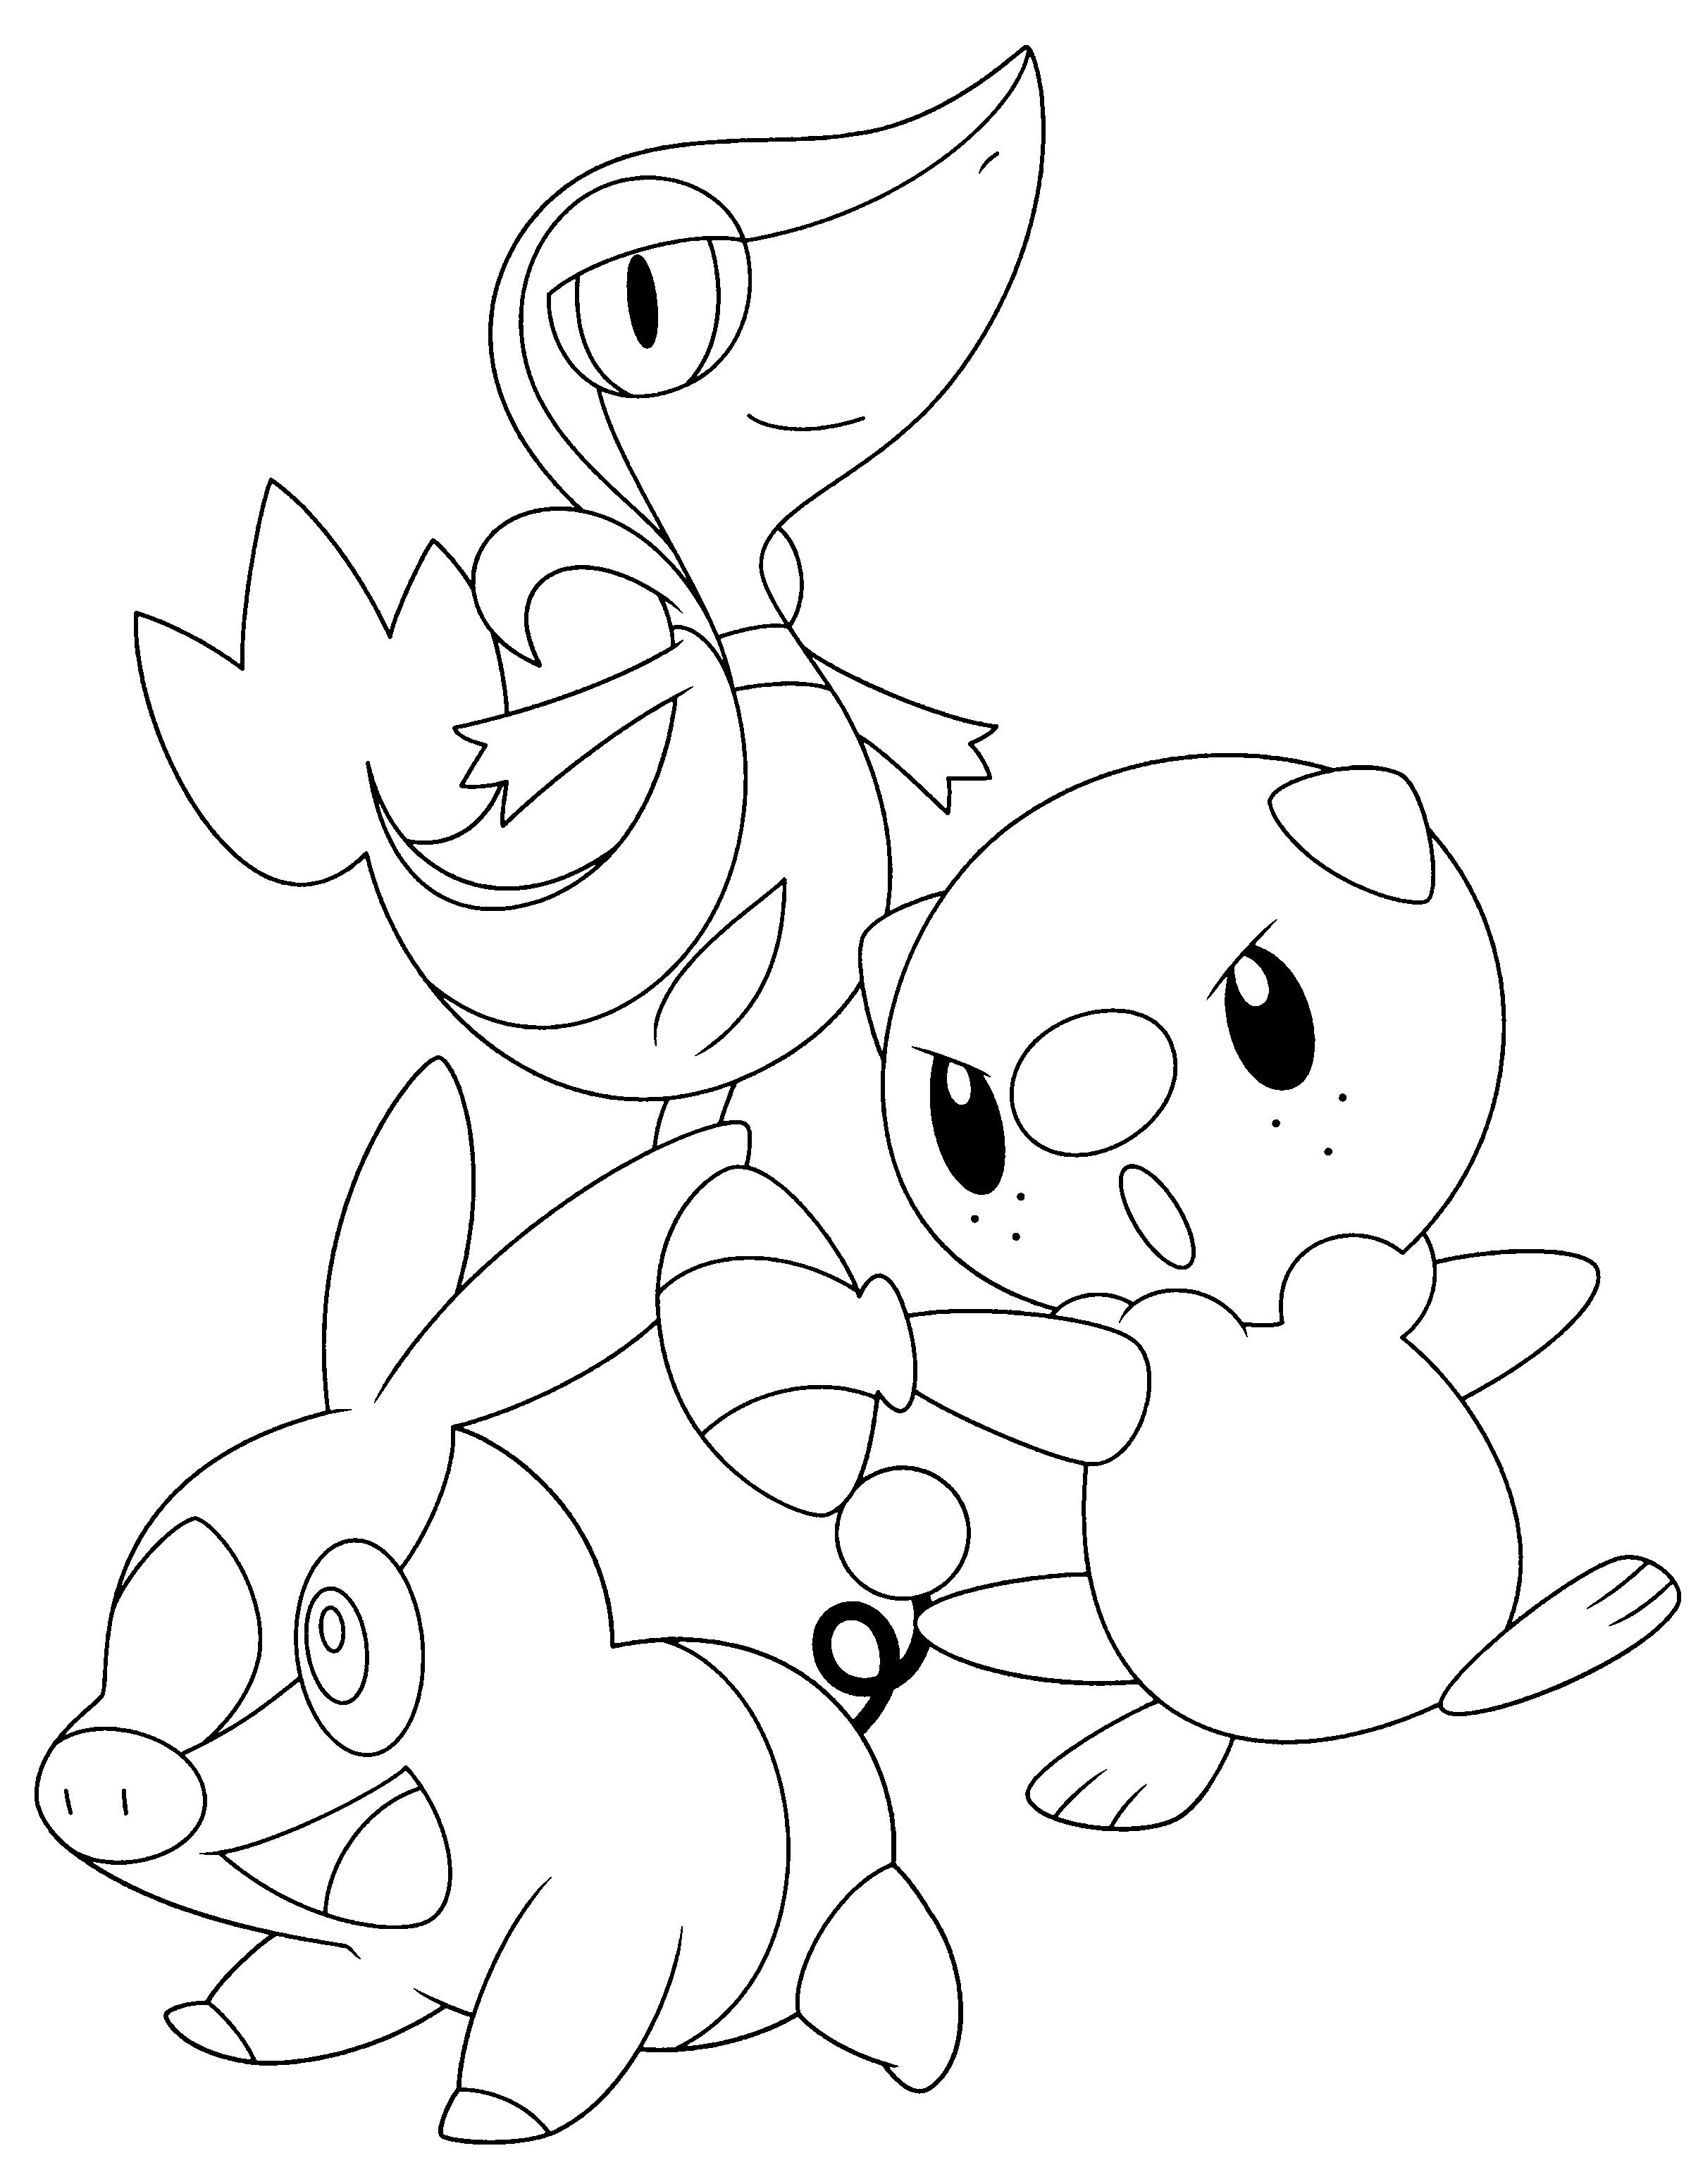 Coloring Pages Pokemon Oshawott Snivy And Tepig Google Search Pokemon Desenhos Colorir